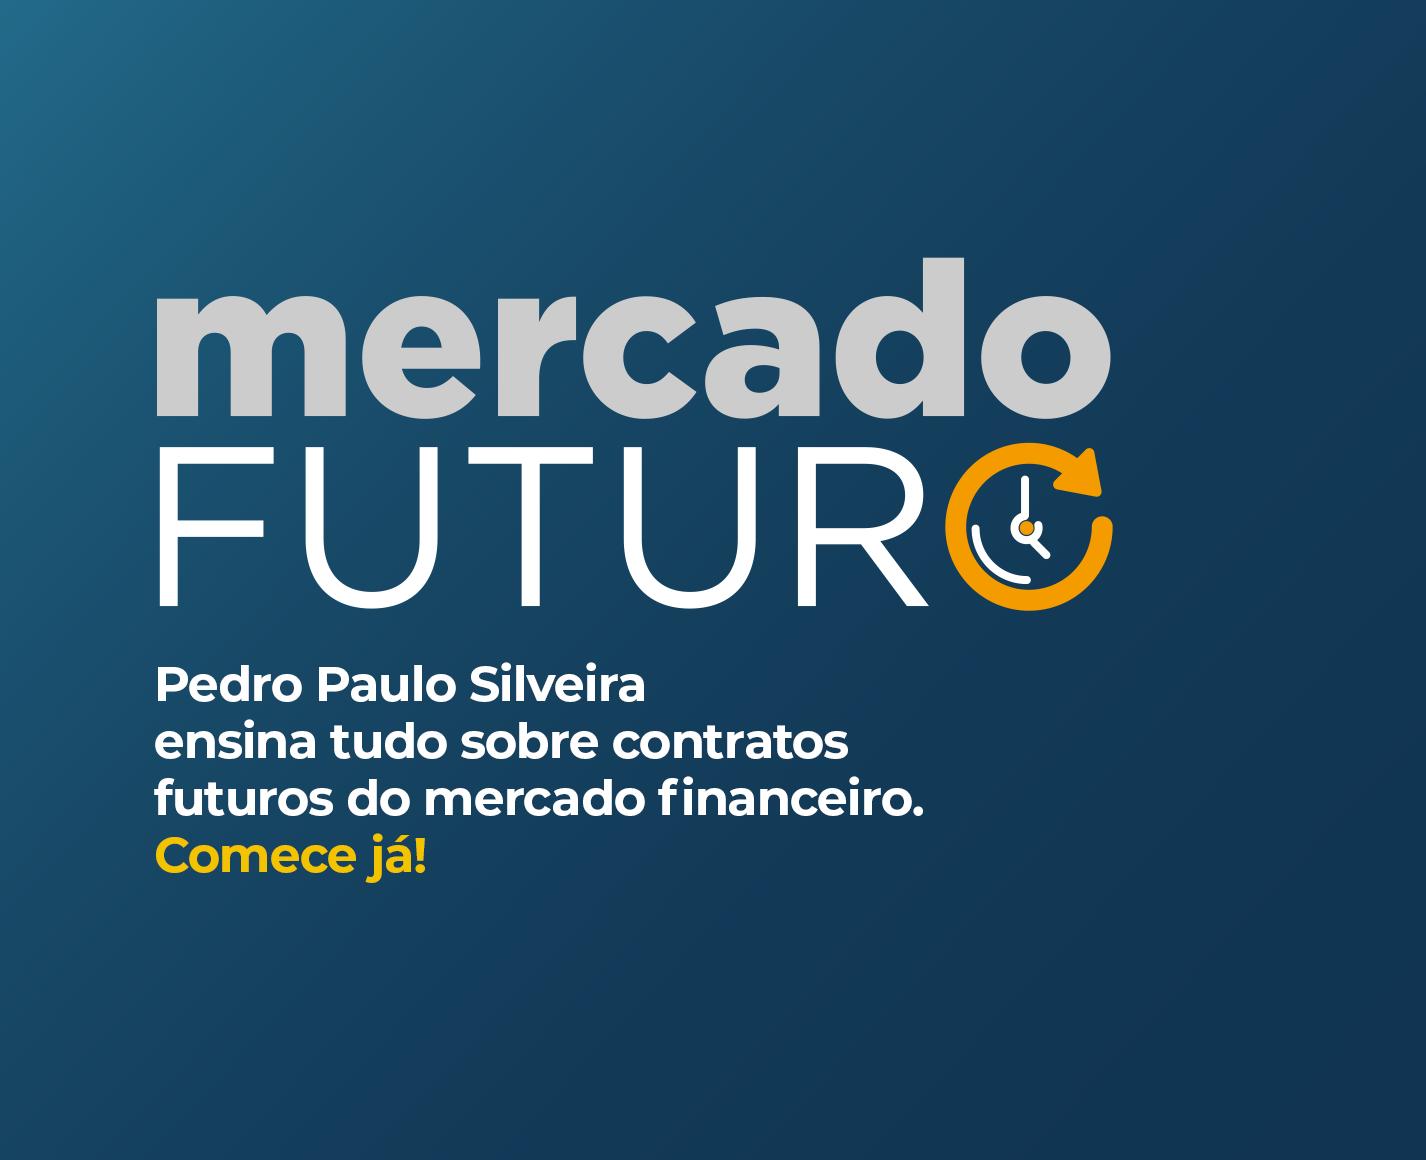 Mercado futuro bg pqno 2